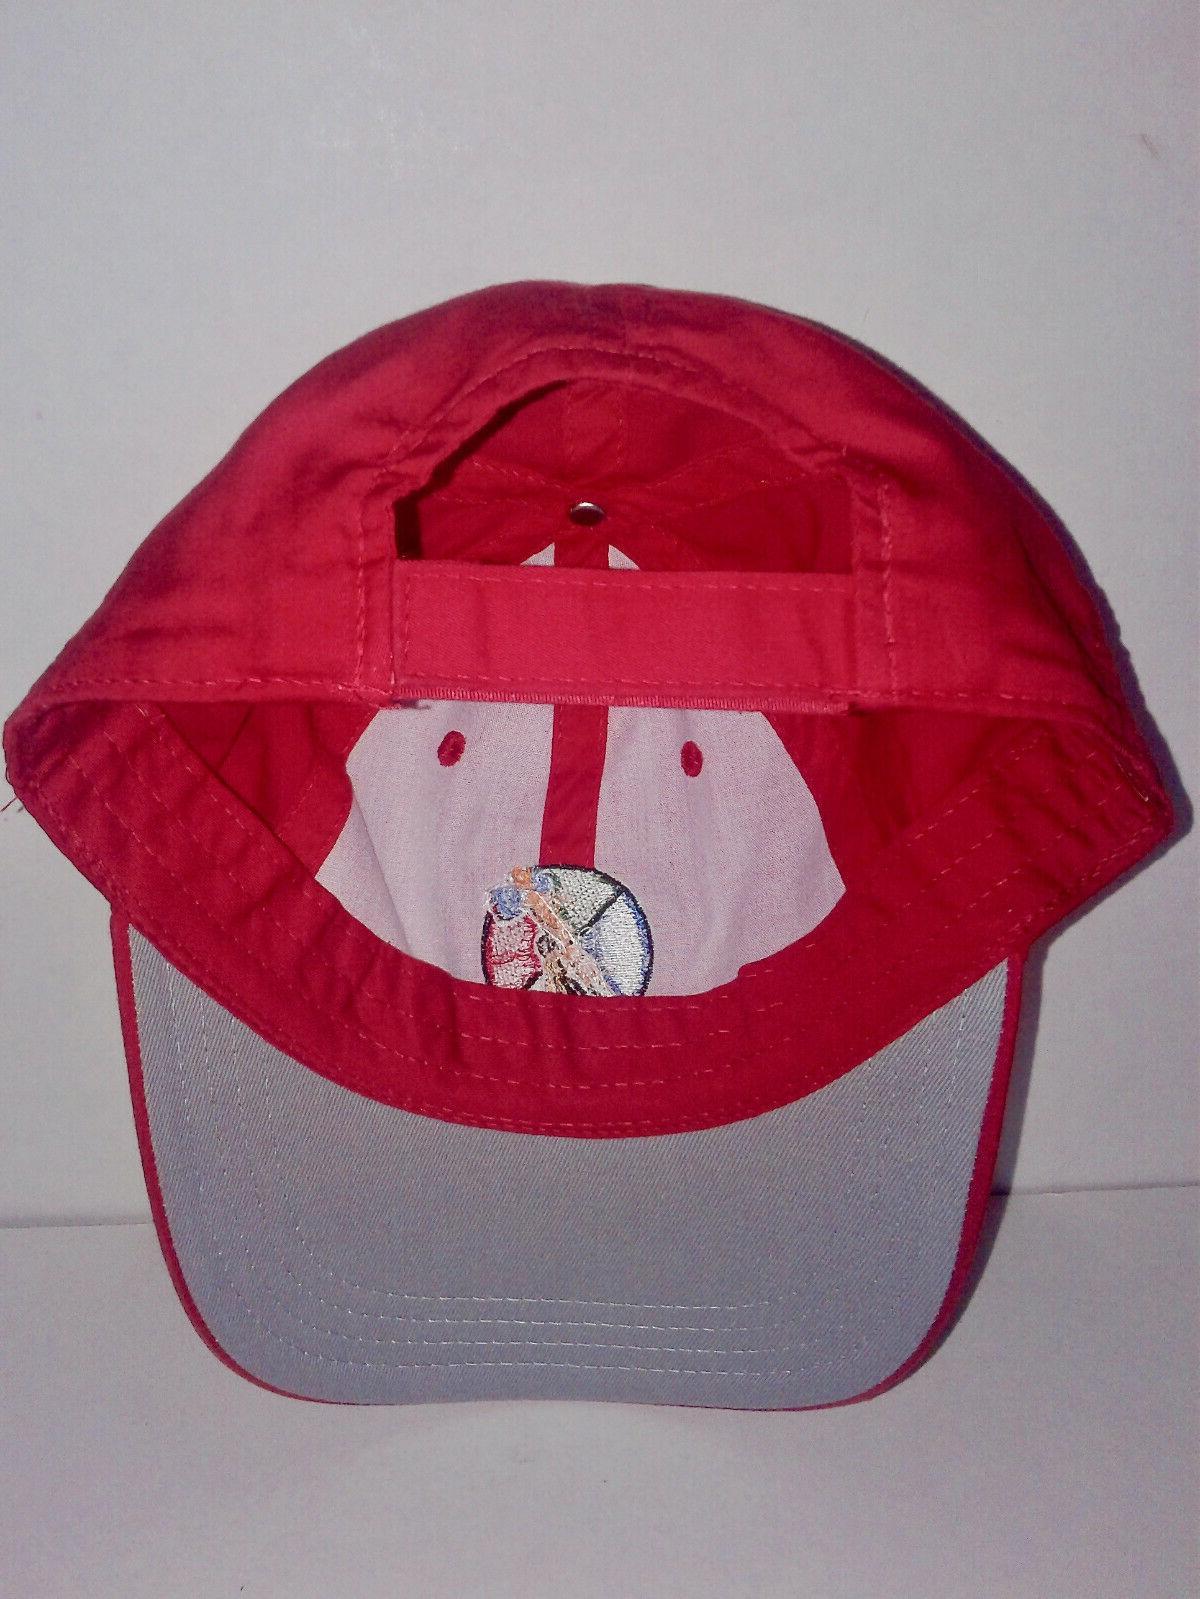 NEW! CHEROKEE GOLF COURSE NEEDLE RED CAP